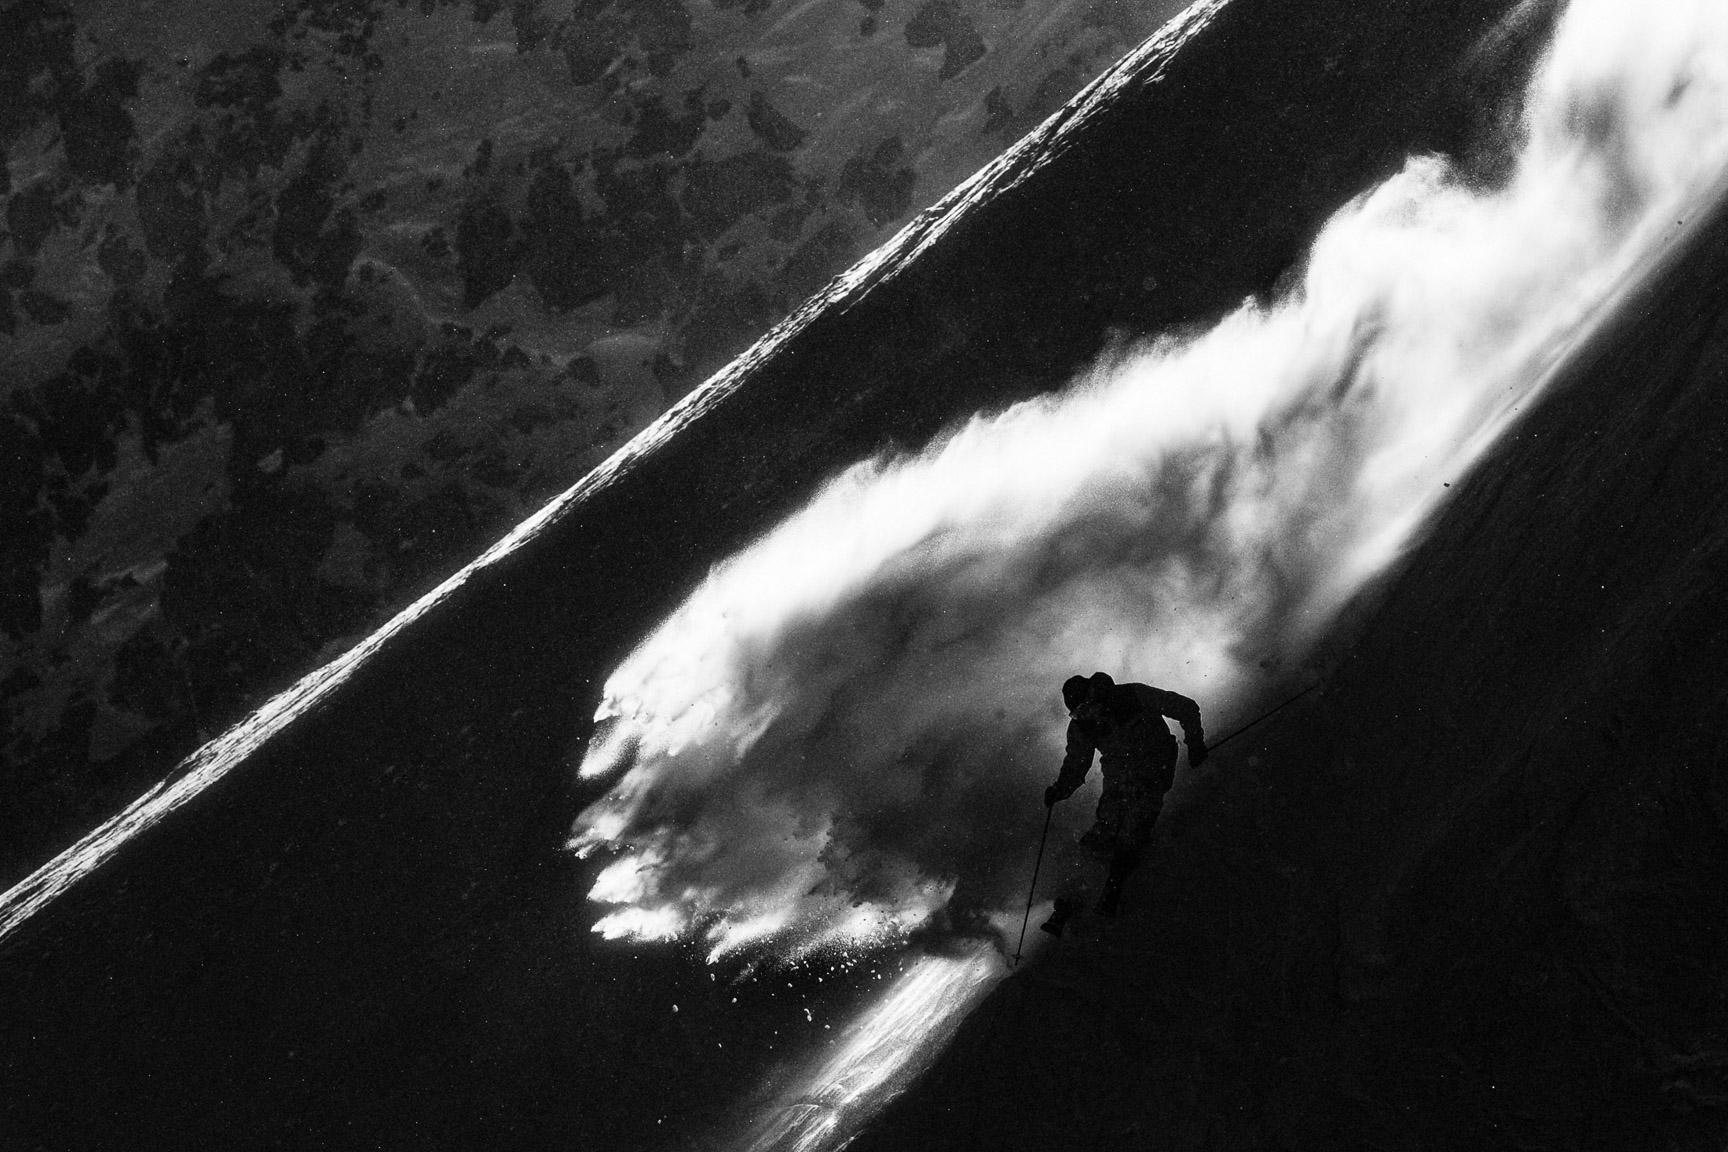 Bernard Rosow, Mammoth Mountain, California